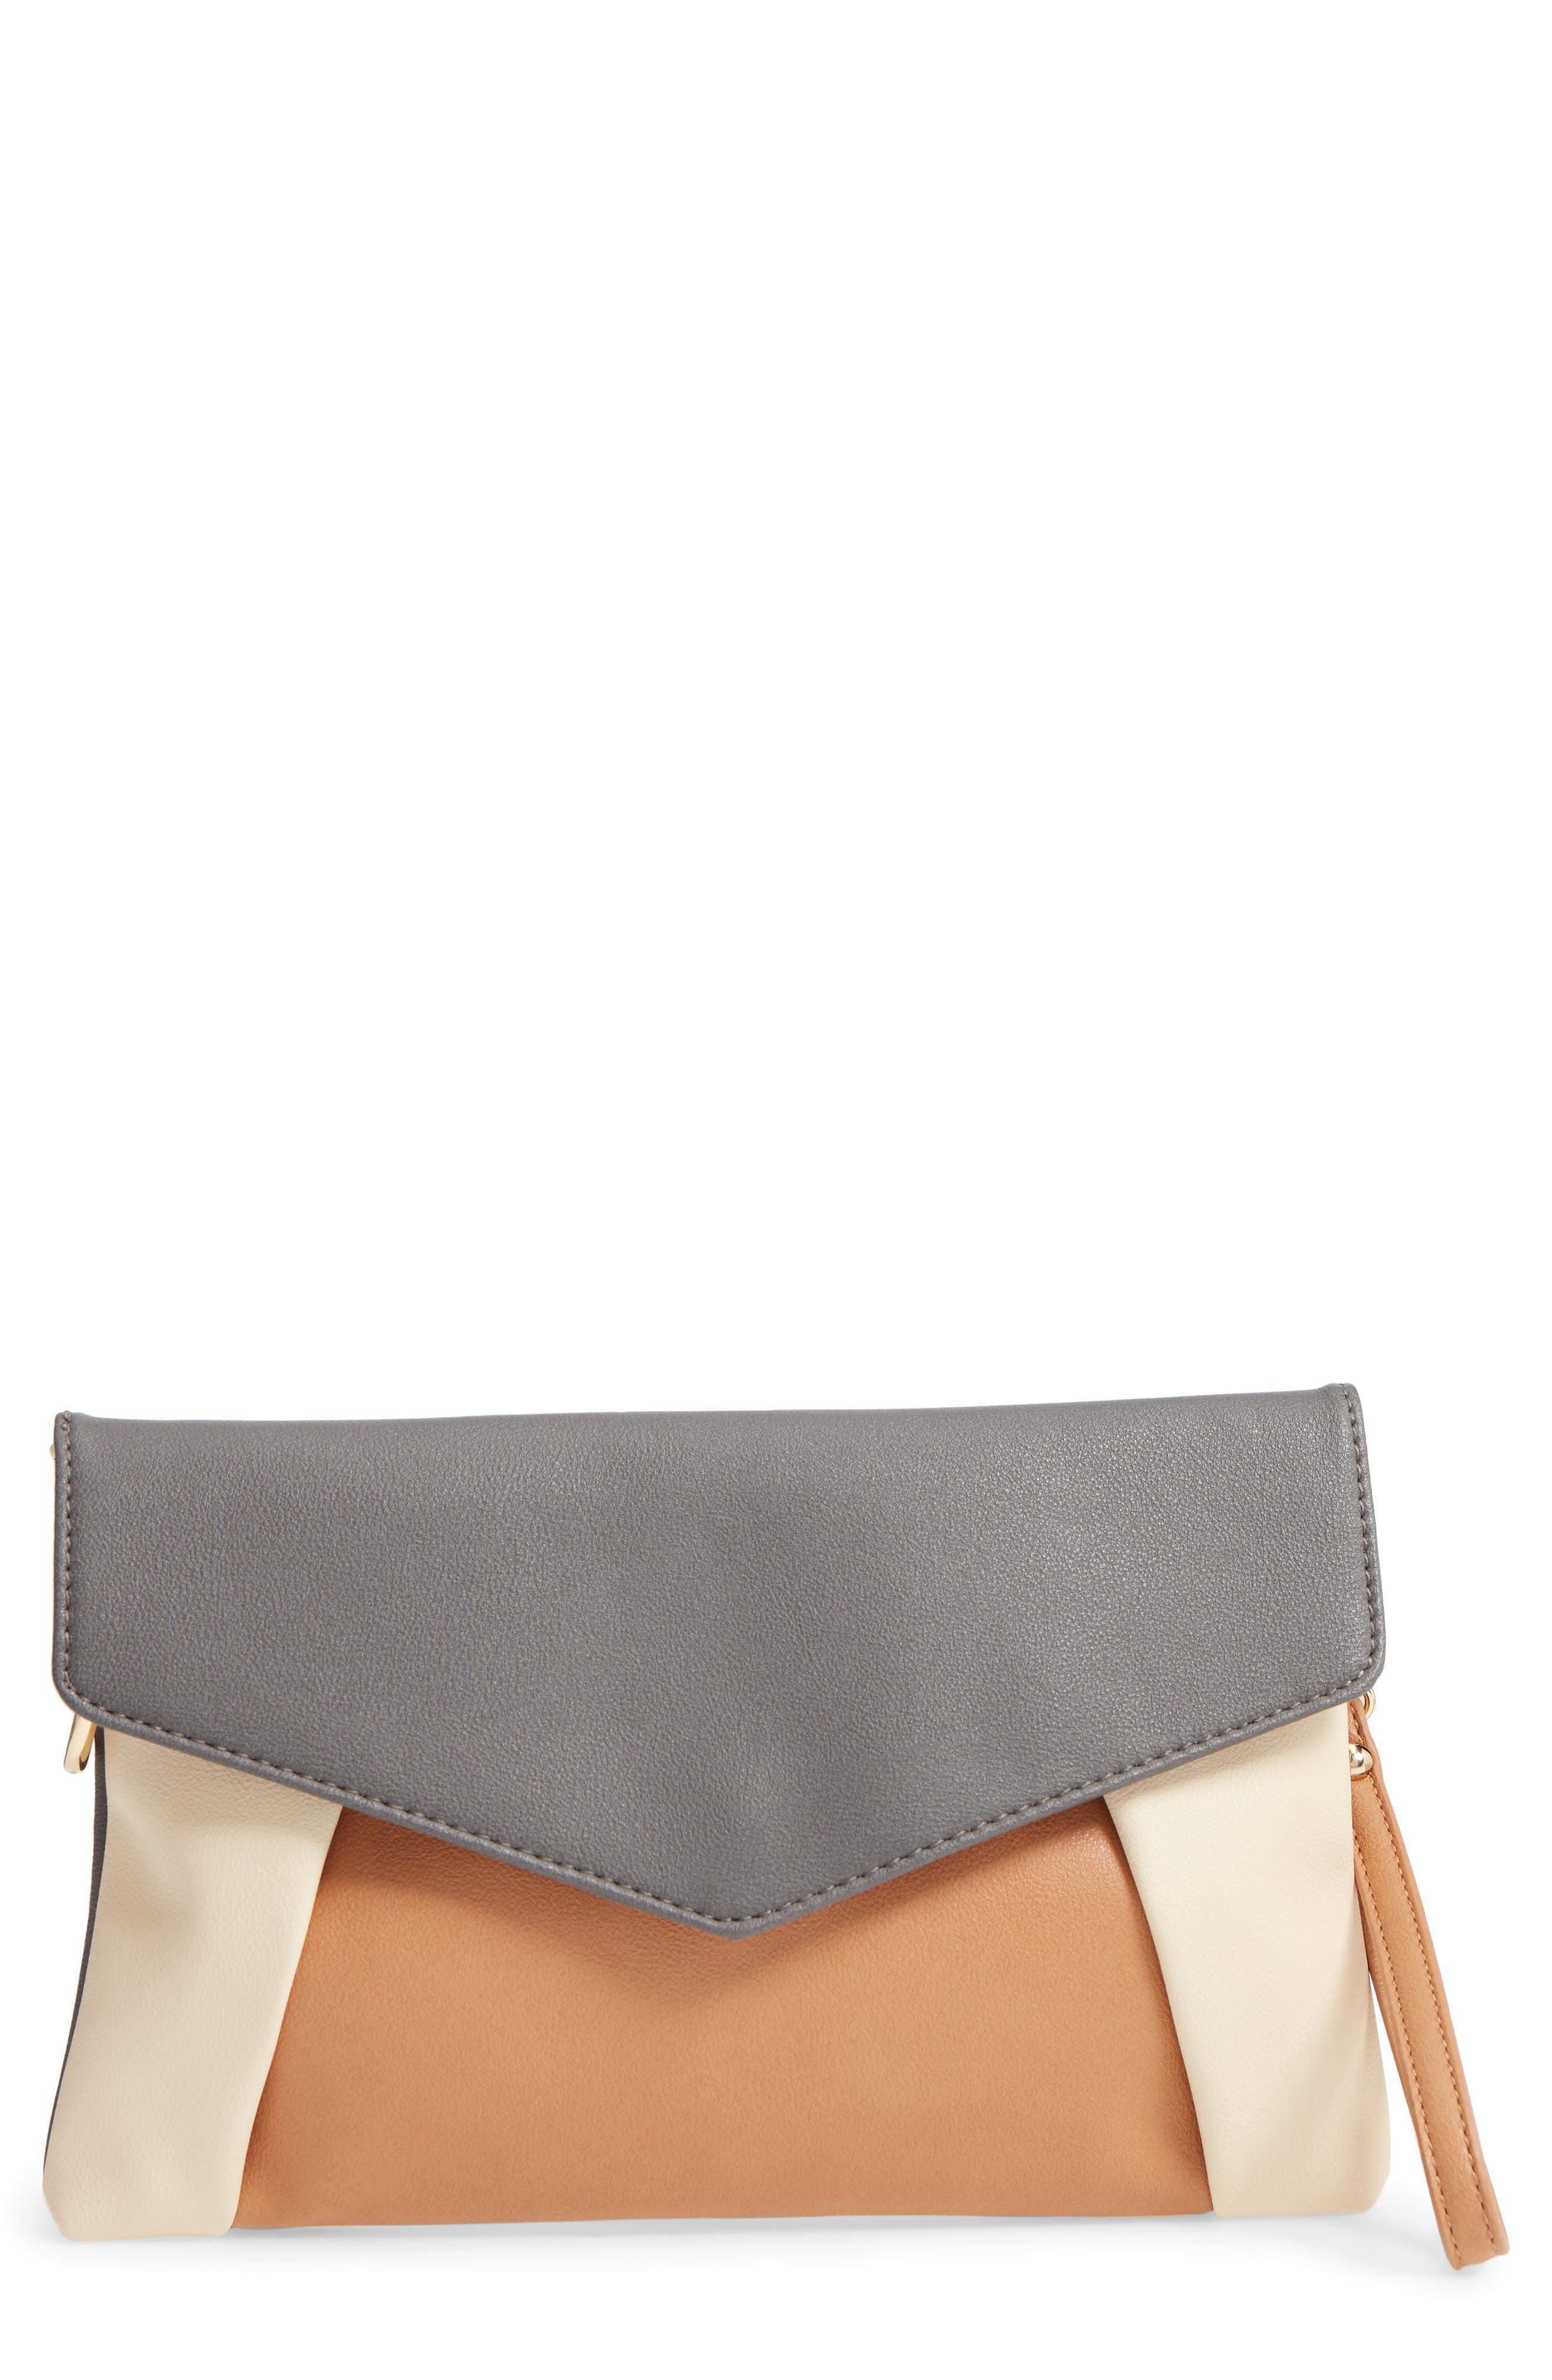 Shea Tricolor Faux Leather Clutch,                             Main thumbnail 1, color,                             Grey Multi